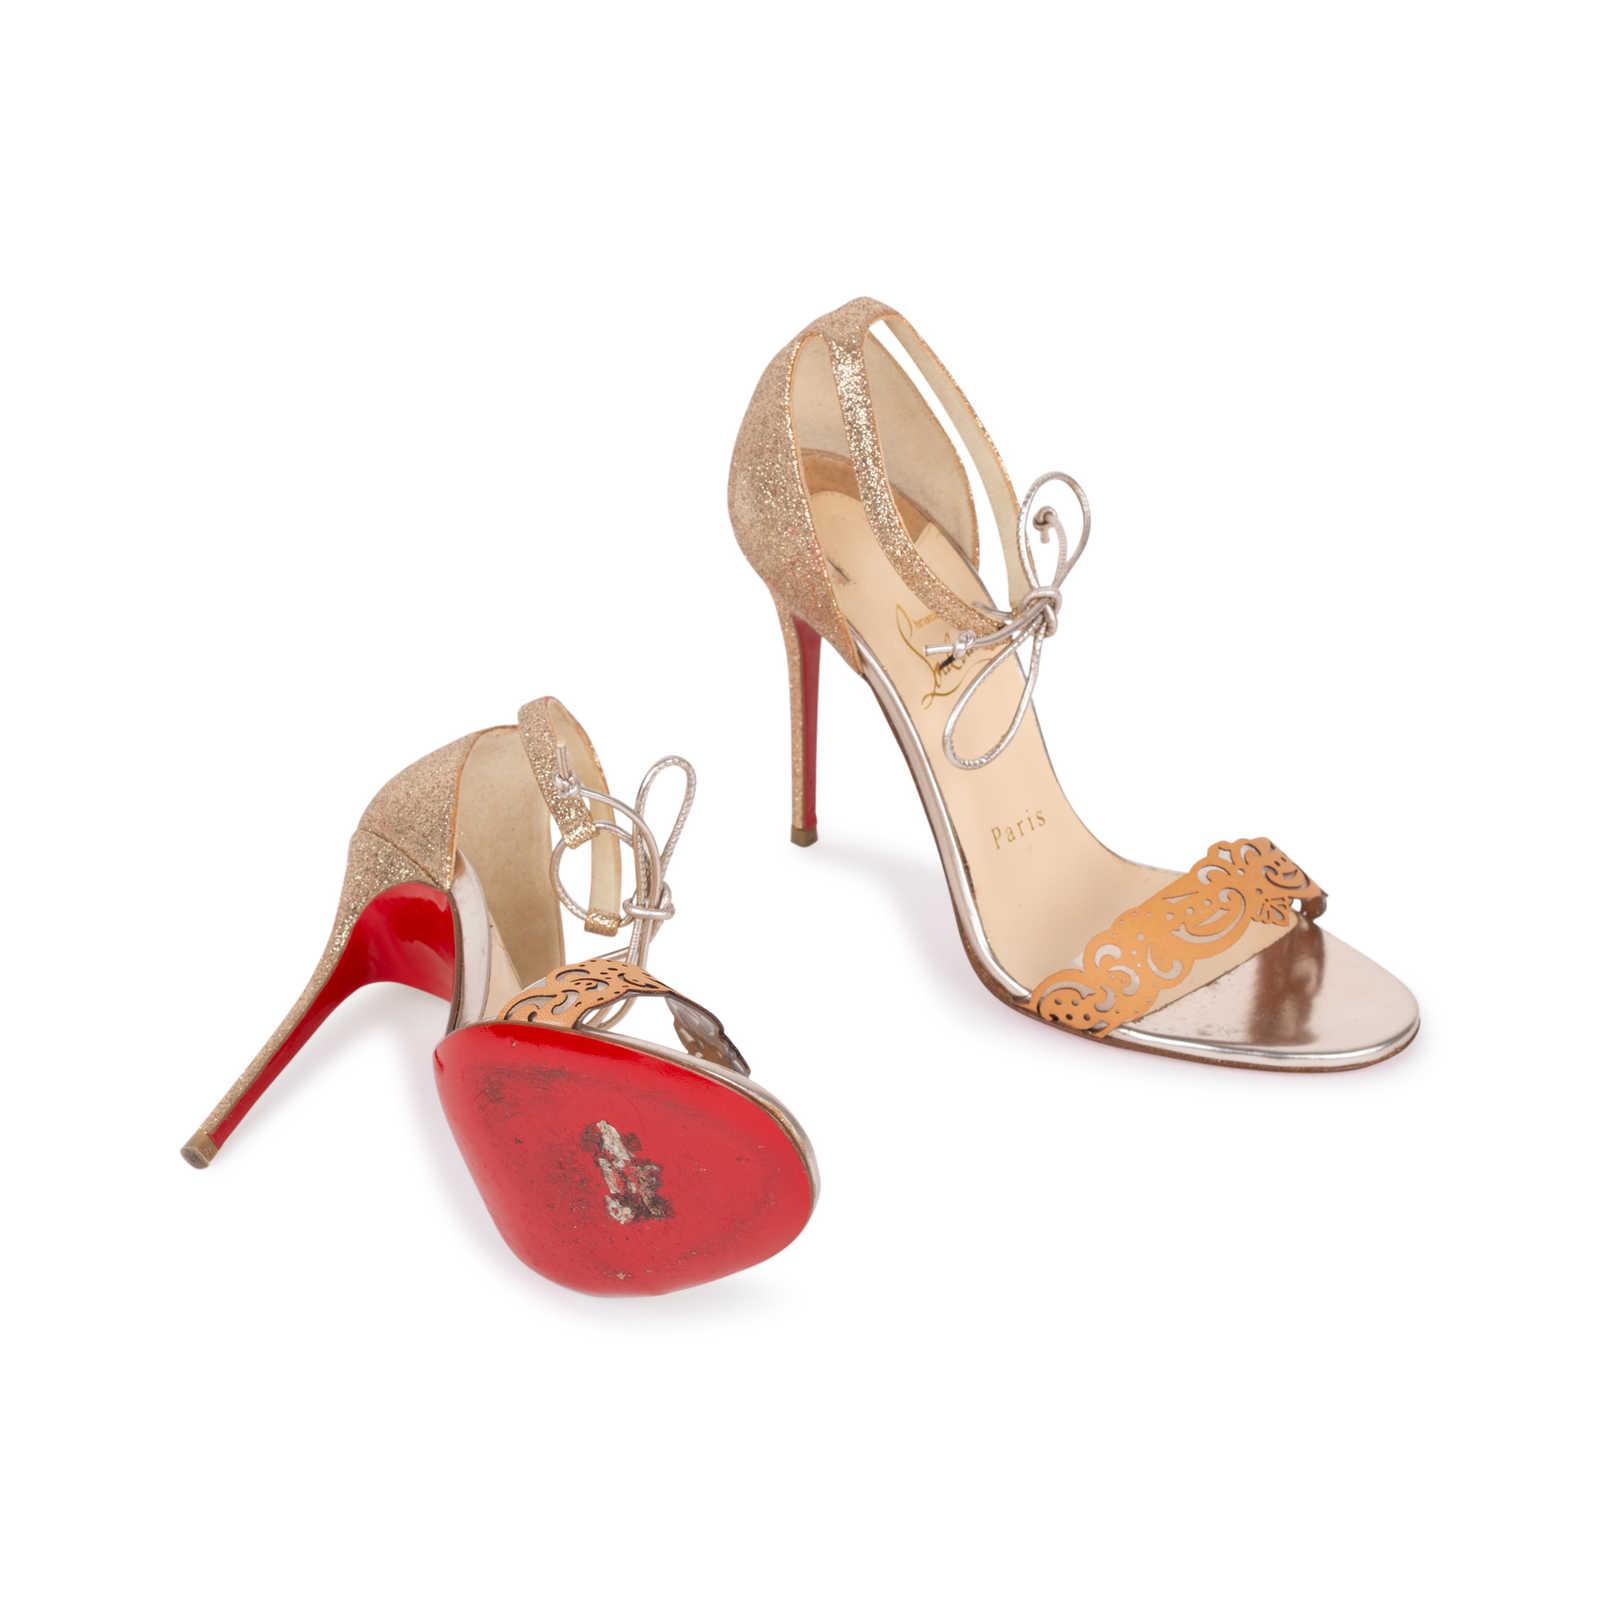 2013759ebd71 ... Authentic Second Hand Christian Louboutin Valnina Laser Cut Sandals  (PSS-583-00003) ...